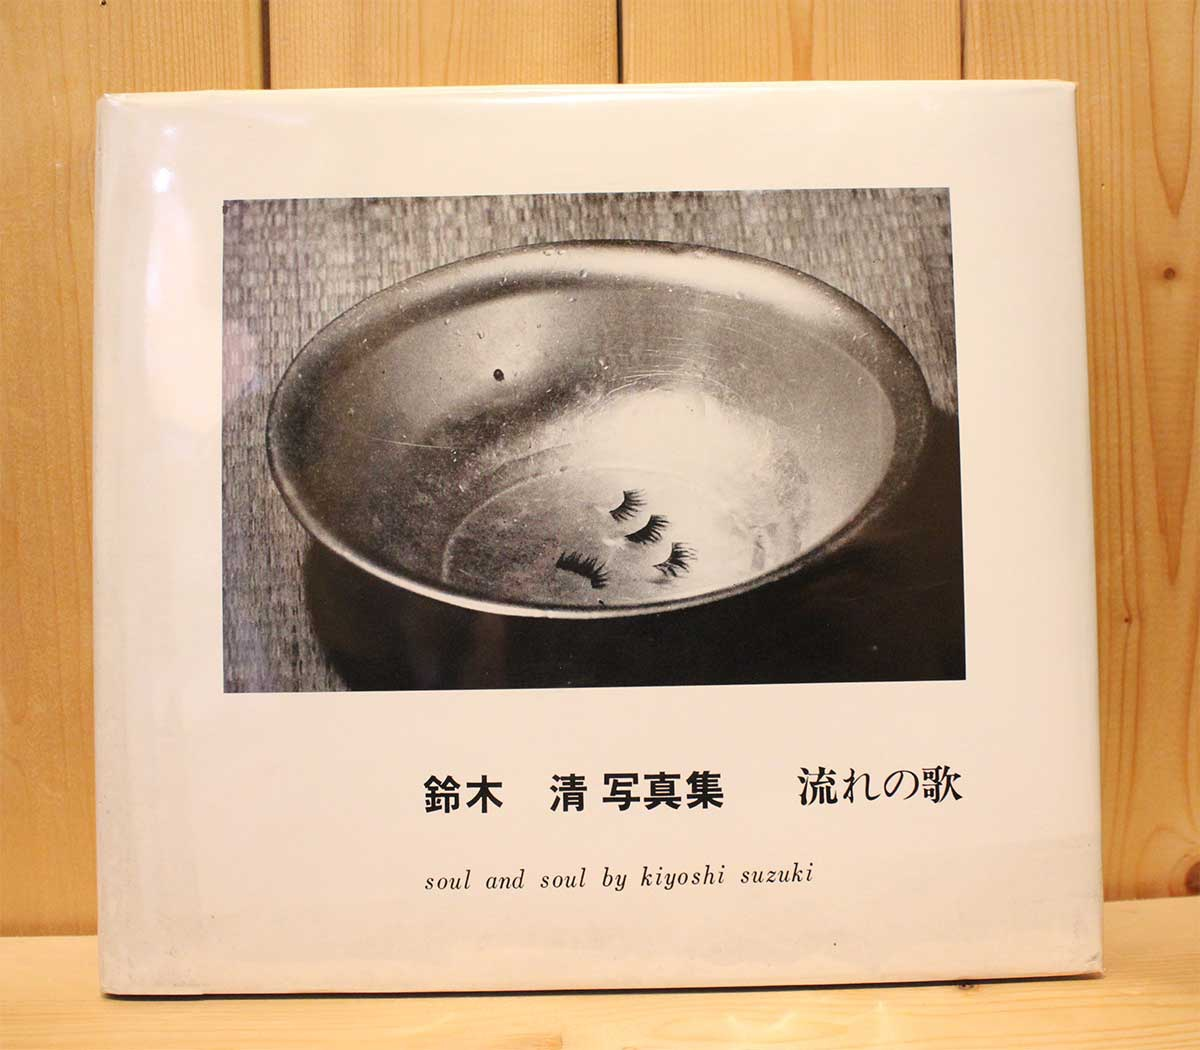 鈴木清 写真集 「流れの歌」